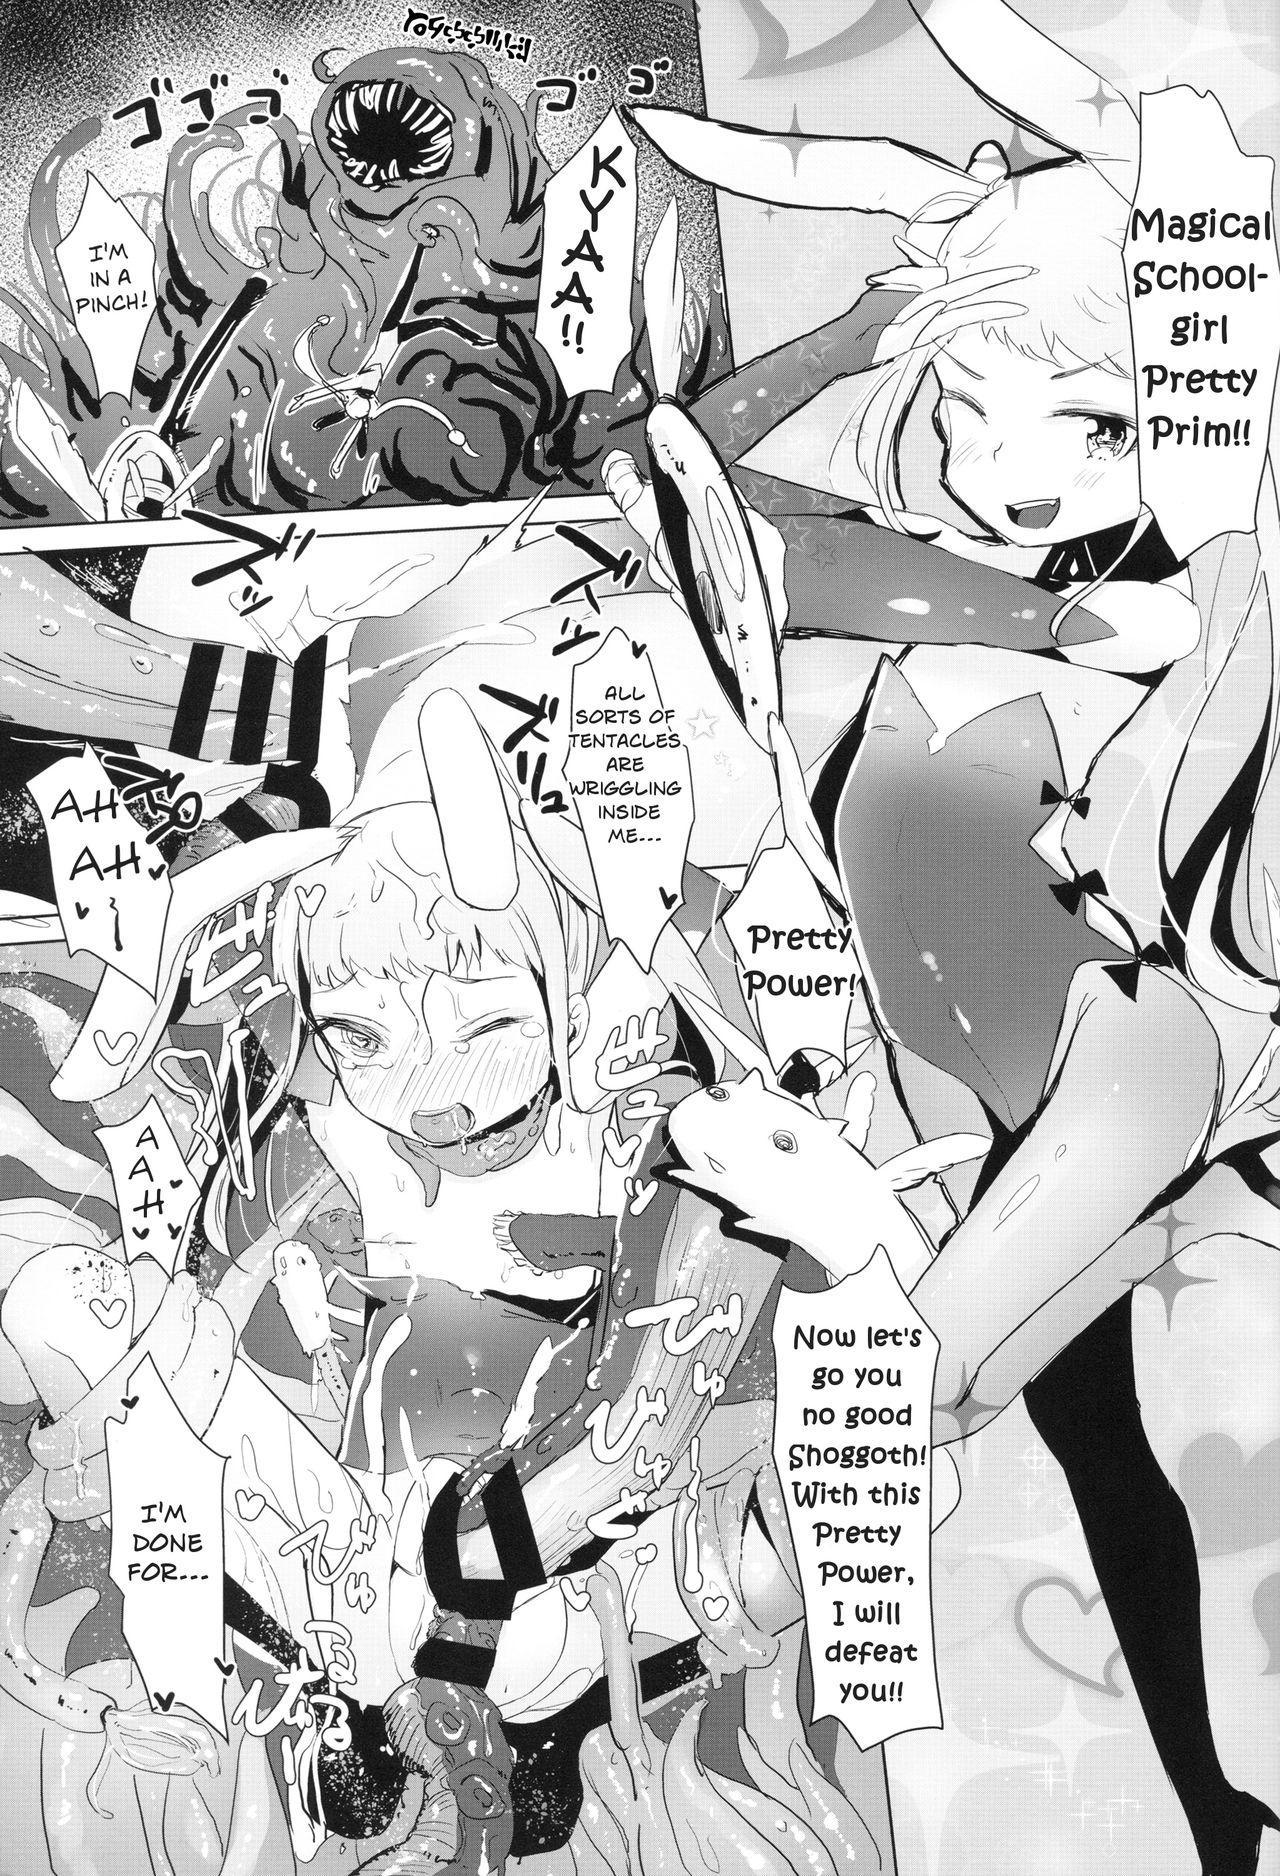 Rachirare Shoujo wa, Manga no Naka de __. Koharu Hen | The Kidnapped Girl in the Manga... Chiharu Chapter 1